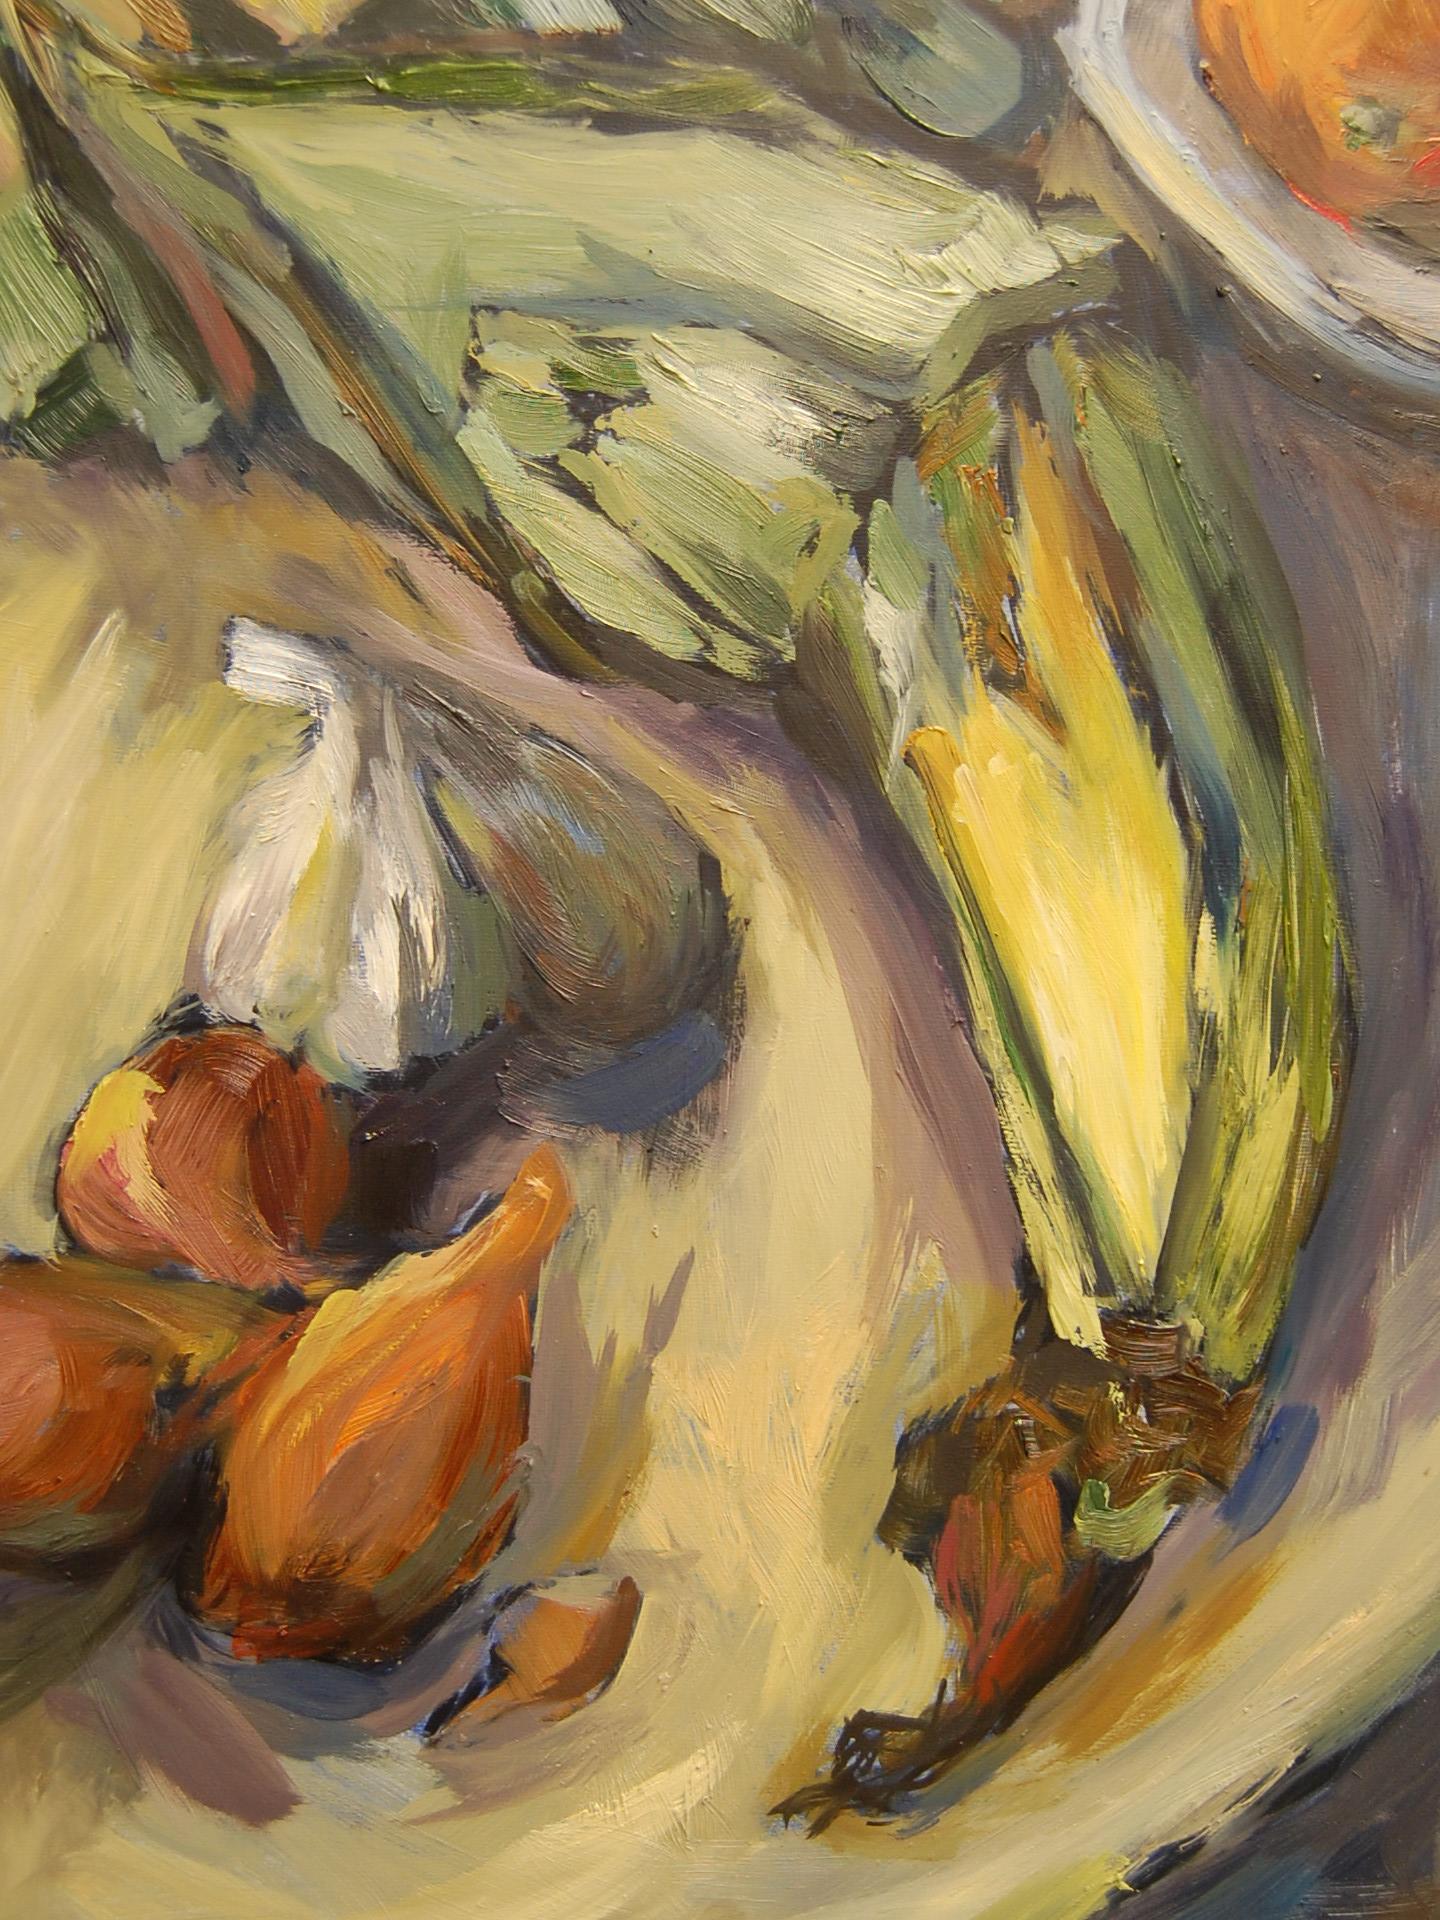 Still Life with Corn, Oil on panel, 2011